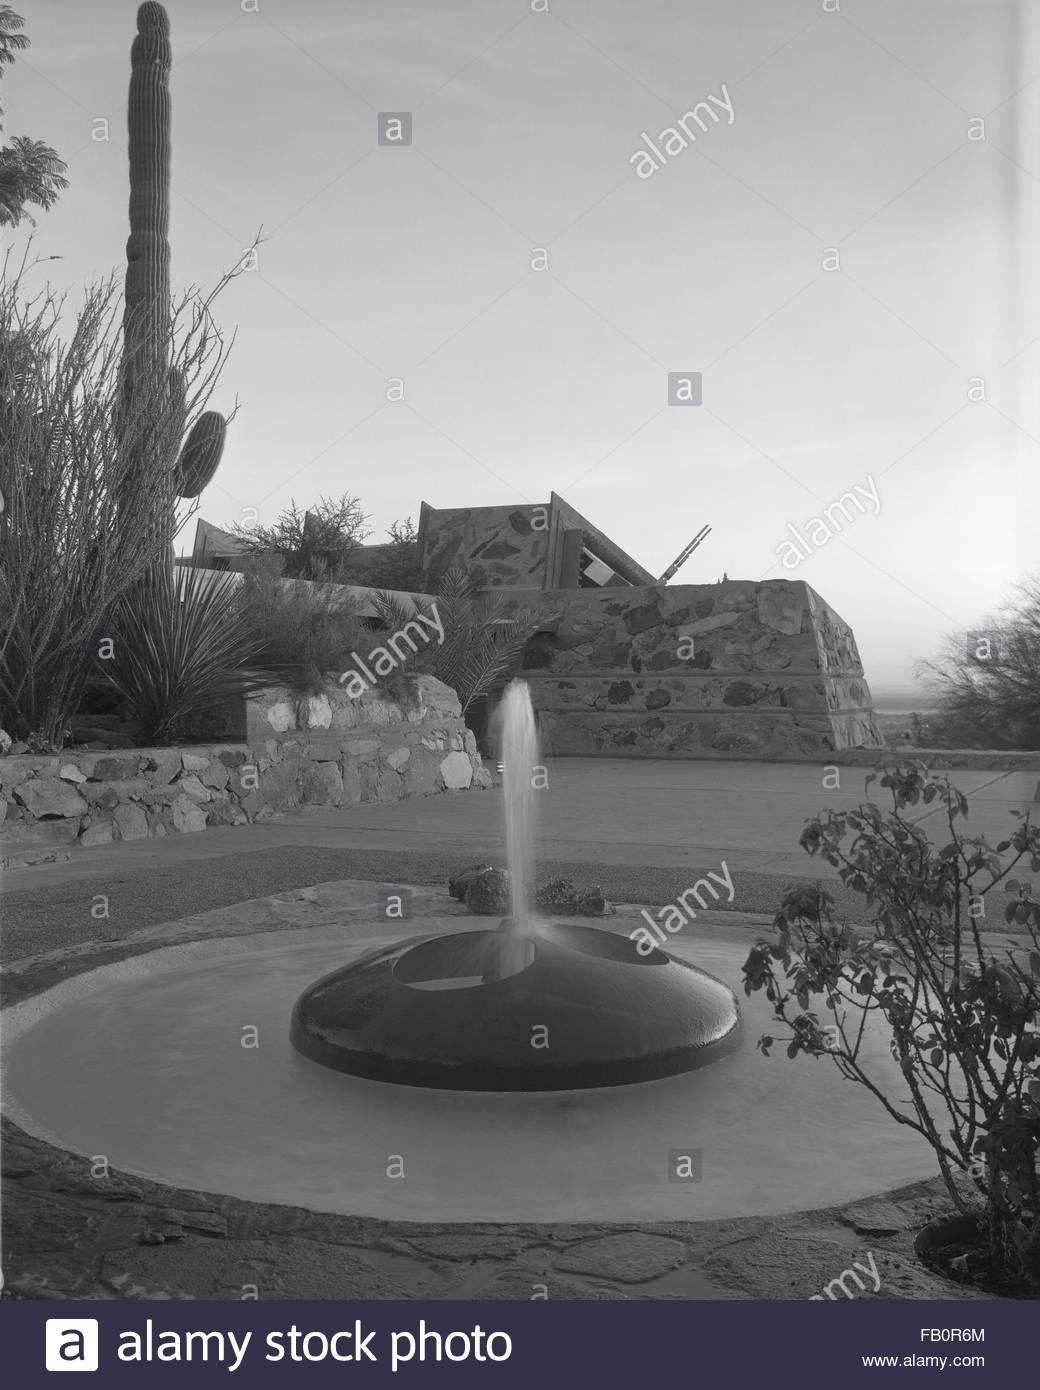 Taliesin West in Scottsdale (Ariz.), 1942 Feb.-1963. Exterior, fountain. - Stock Image